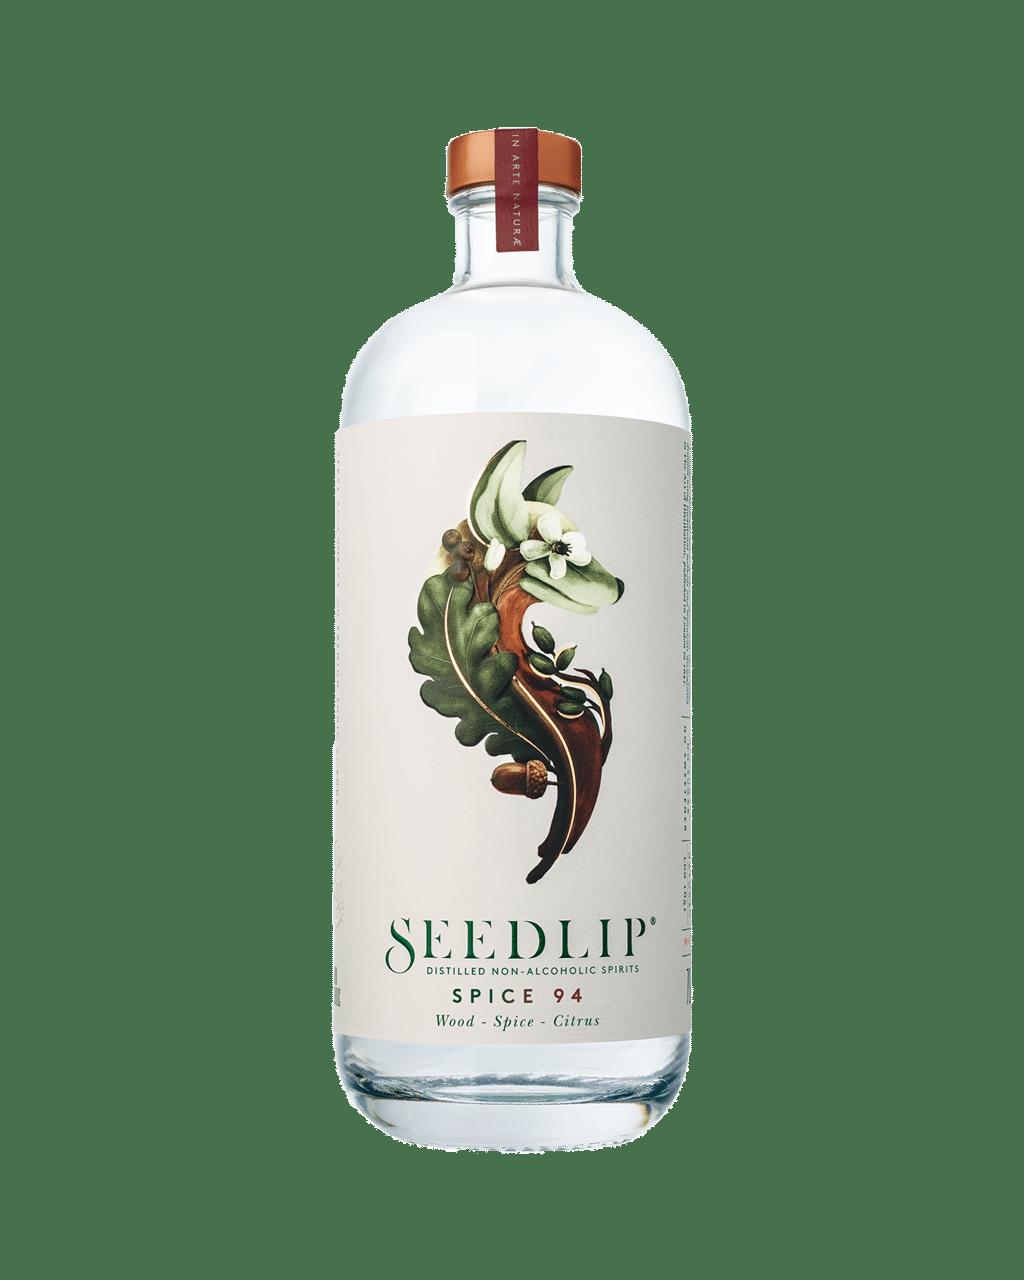 Buy Seedlip Spice 94 Non-Alcoholic Spirit 700mL | Dan Murphy's